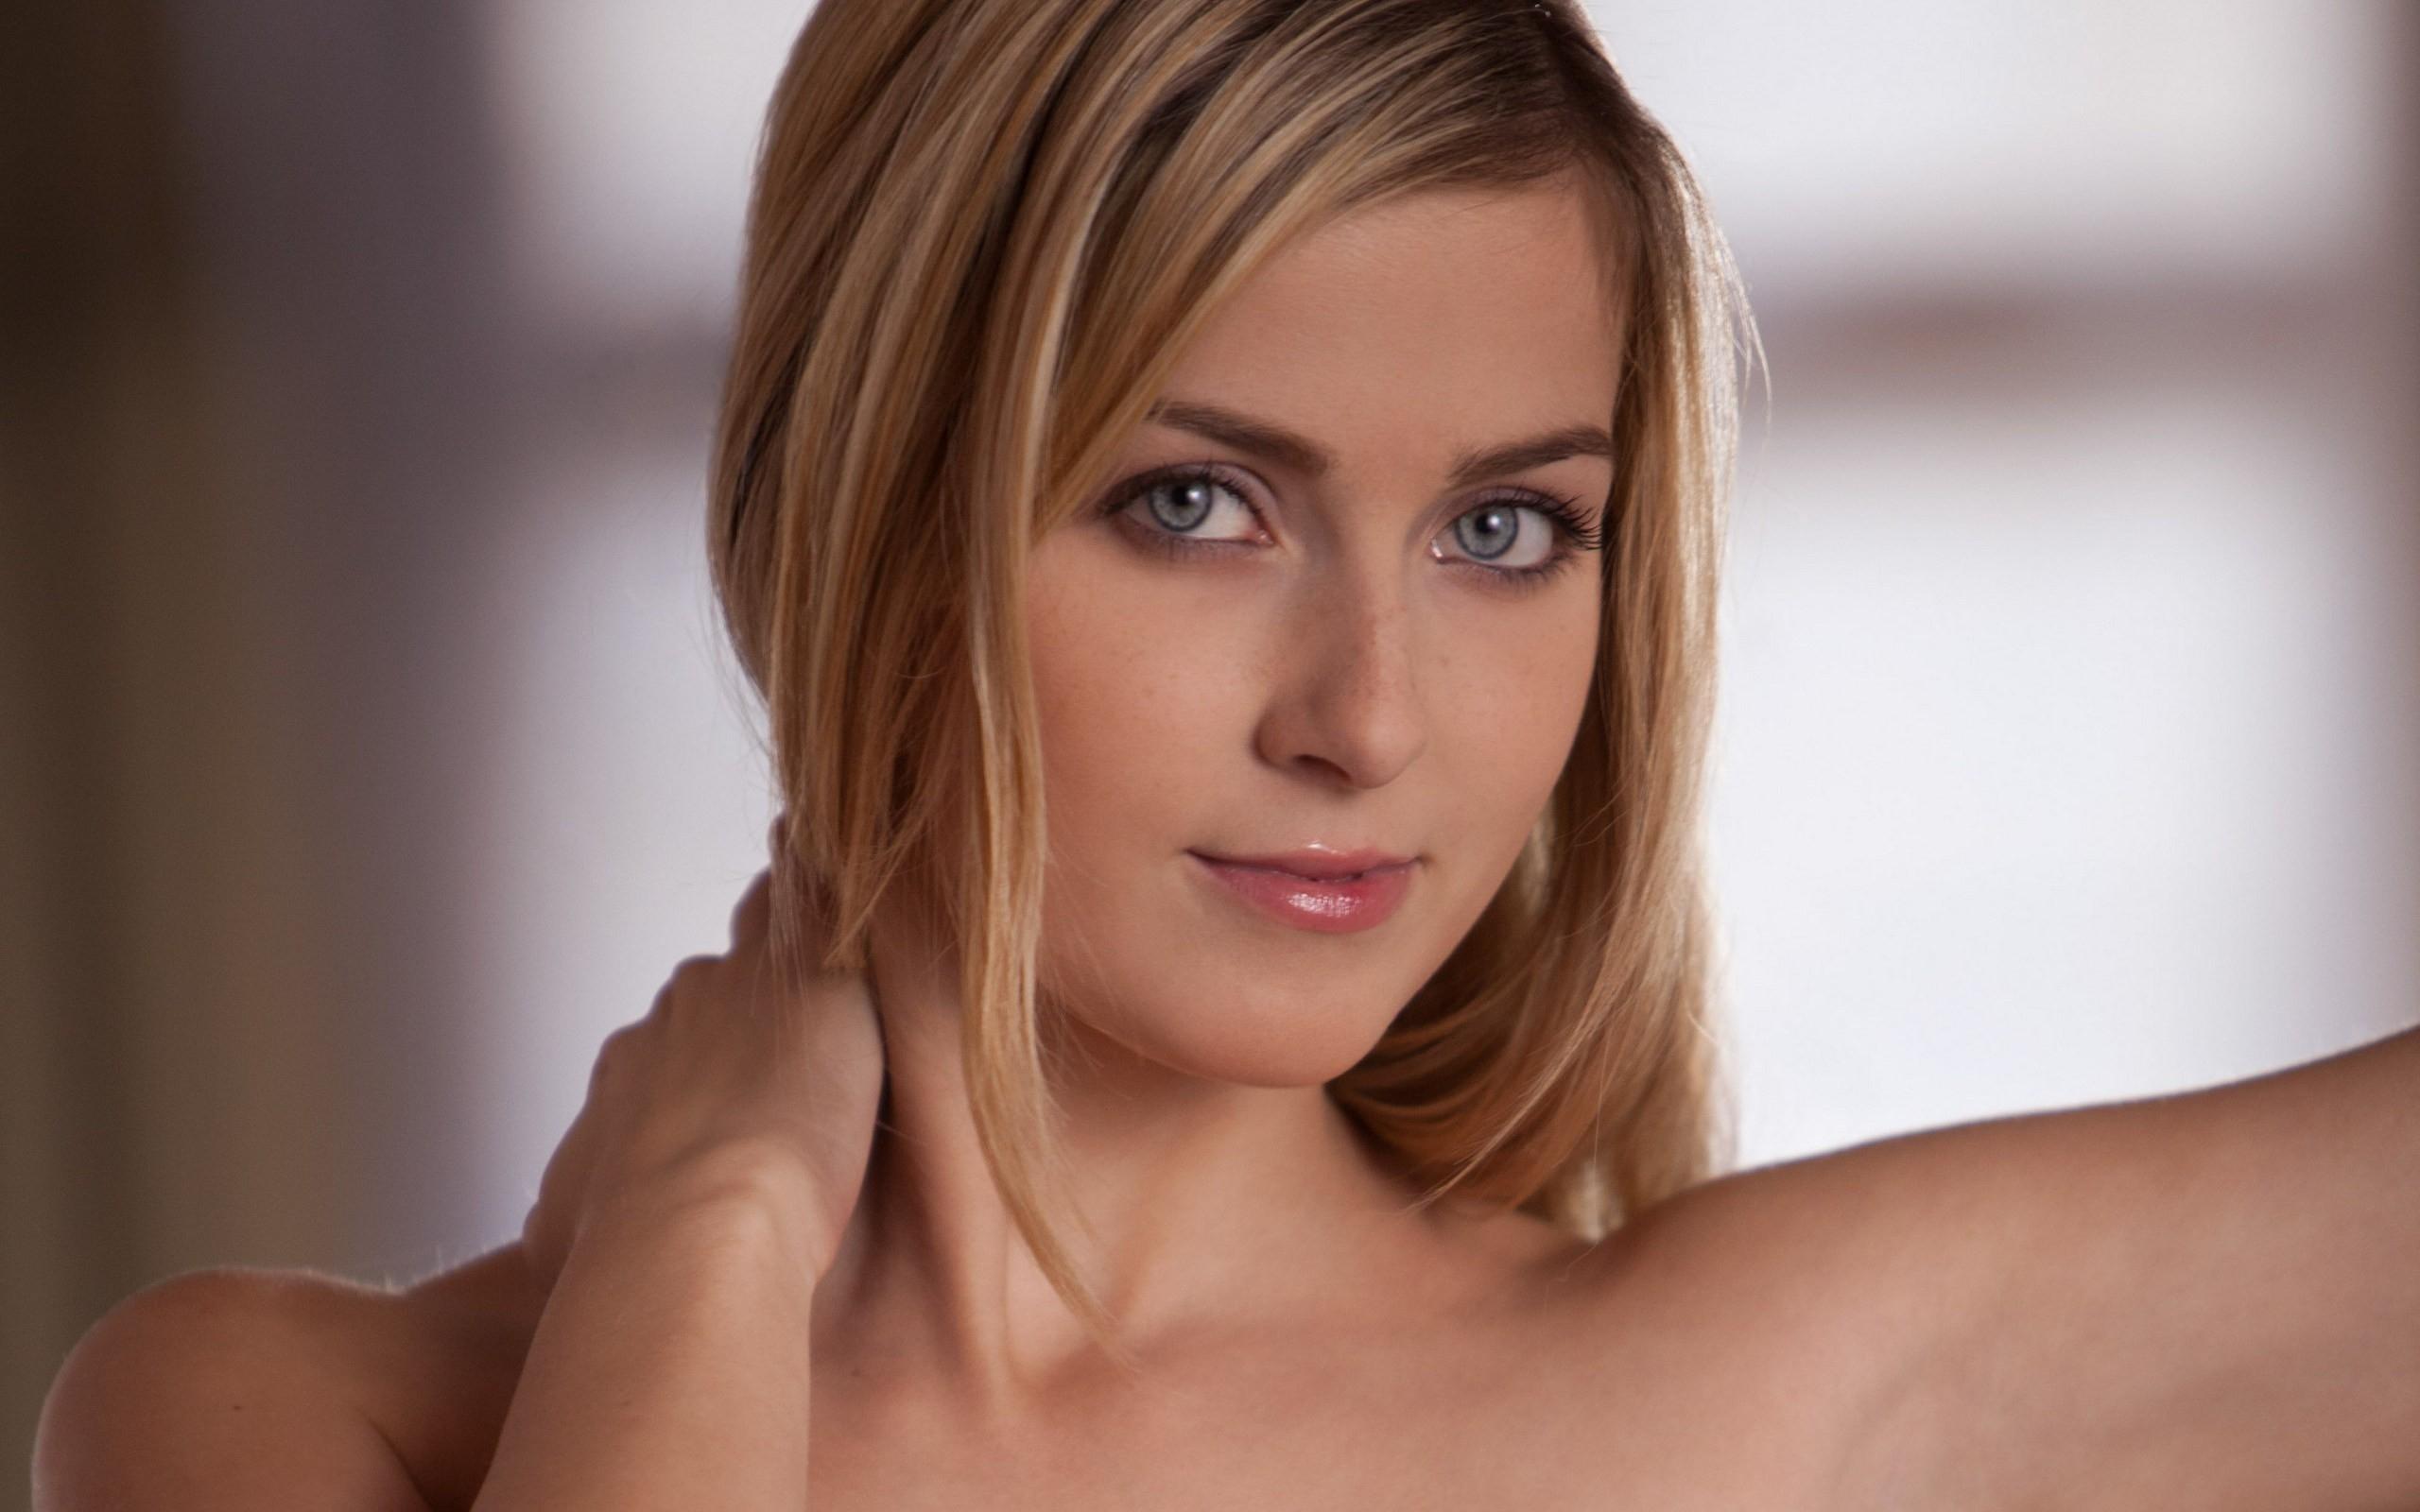 Wallpaper  Face, Blonde, Eyes, Long Hair, Black Hair -1023